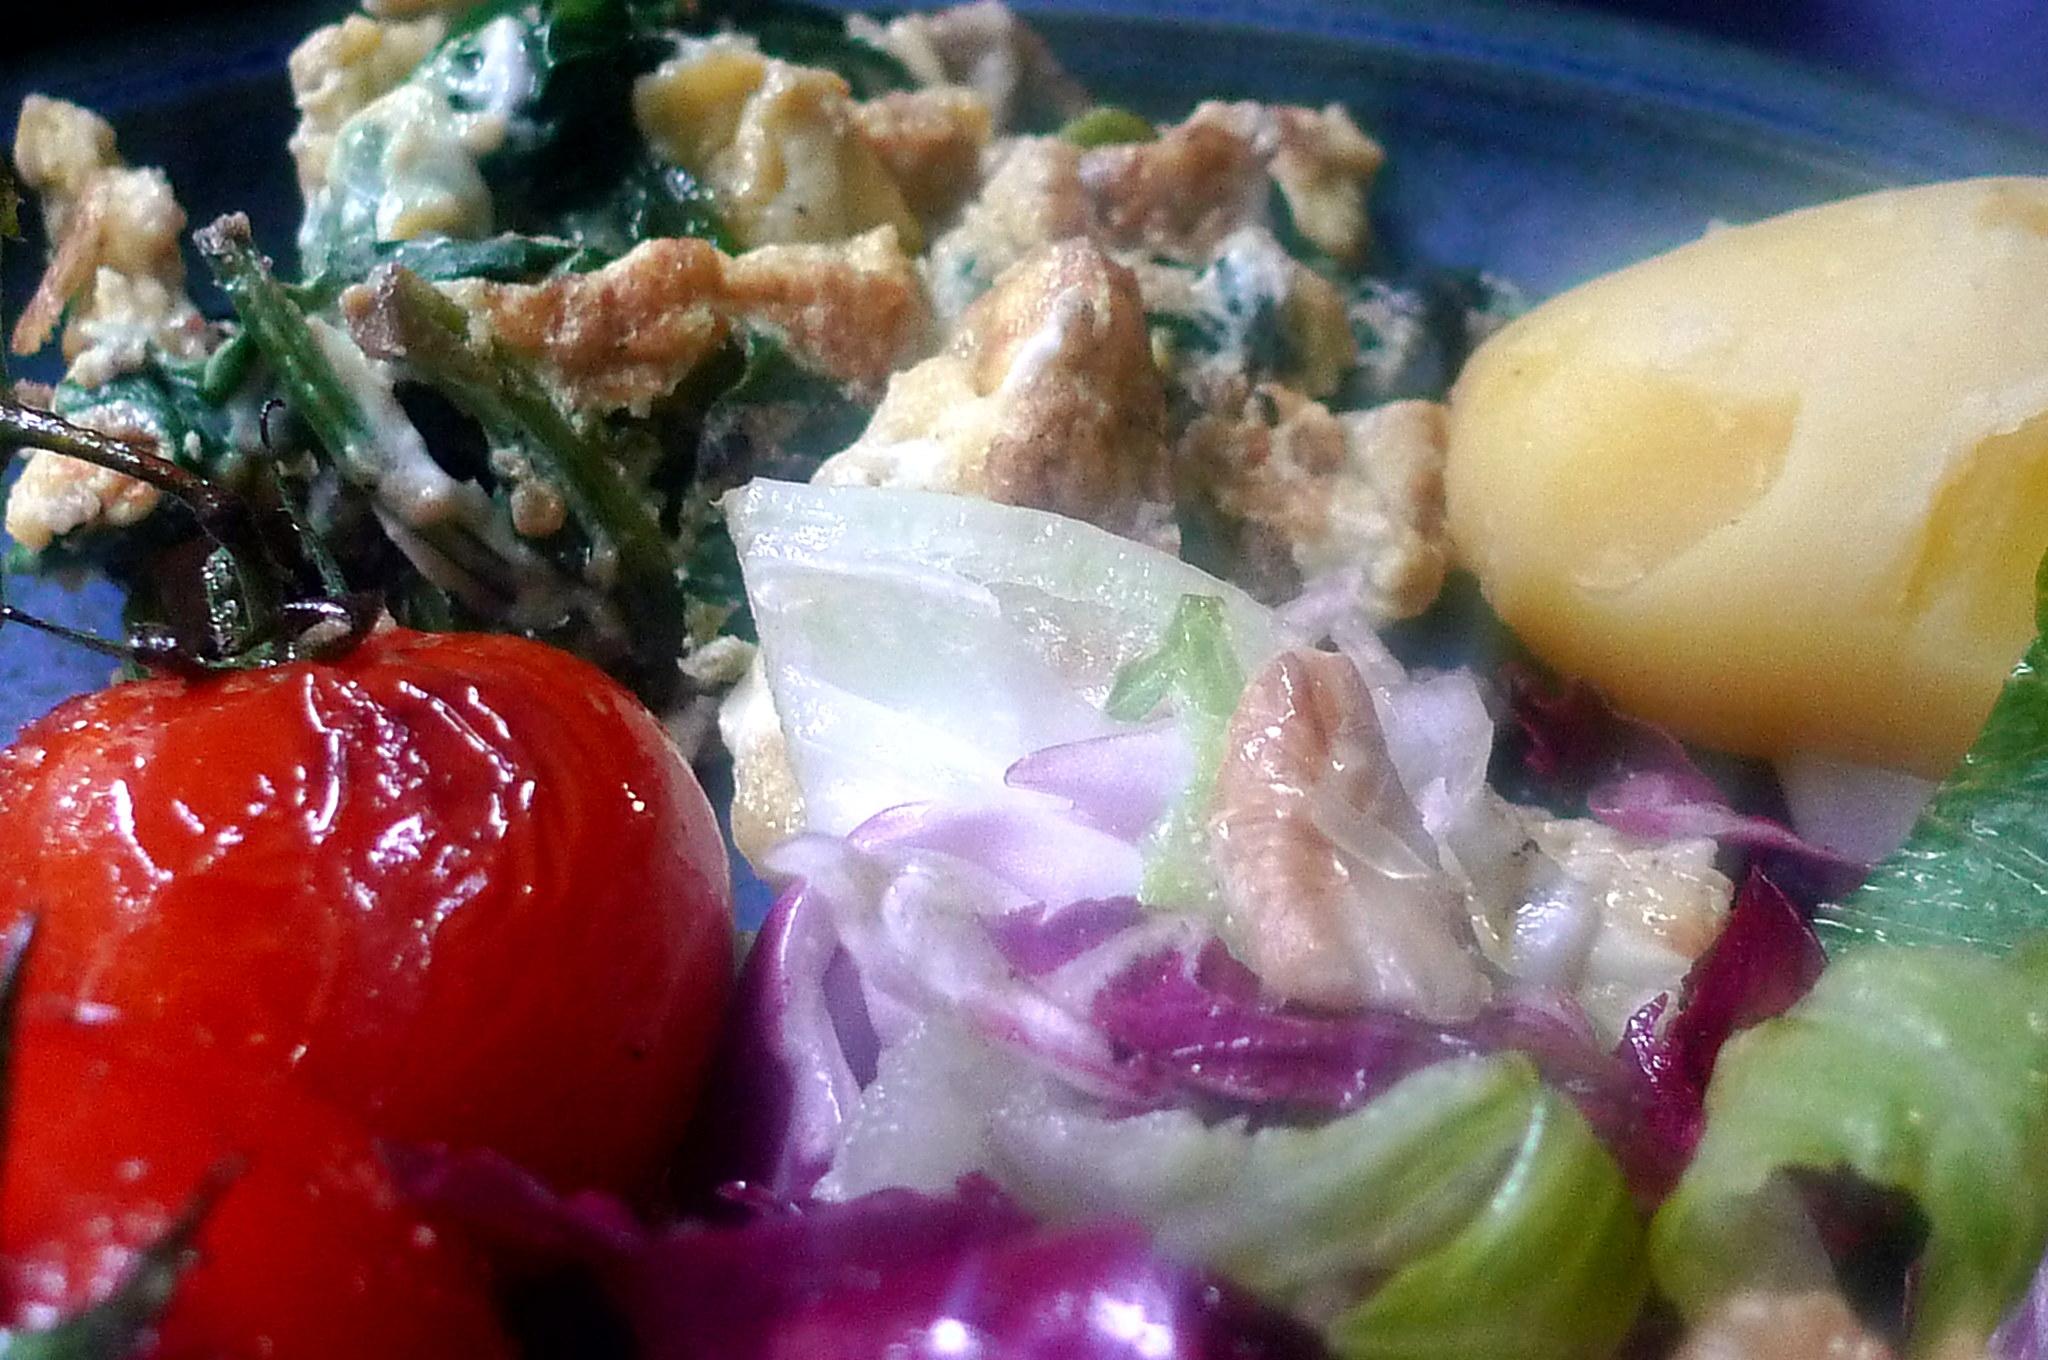 Spinat mit Rührei,Salat,Kartoffel,gebratene Tomaten -- 11.9.14   (15)